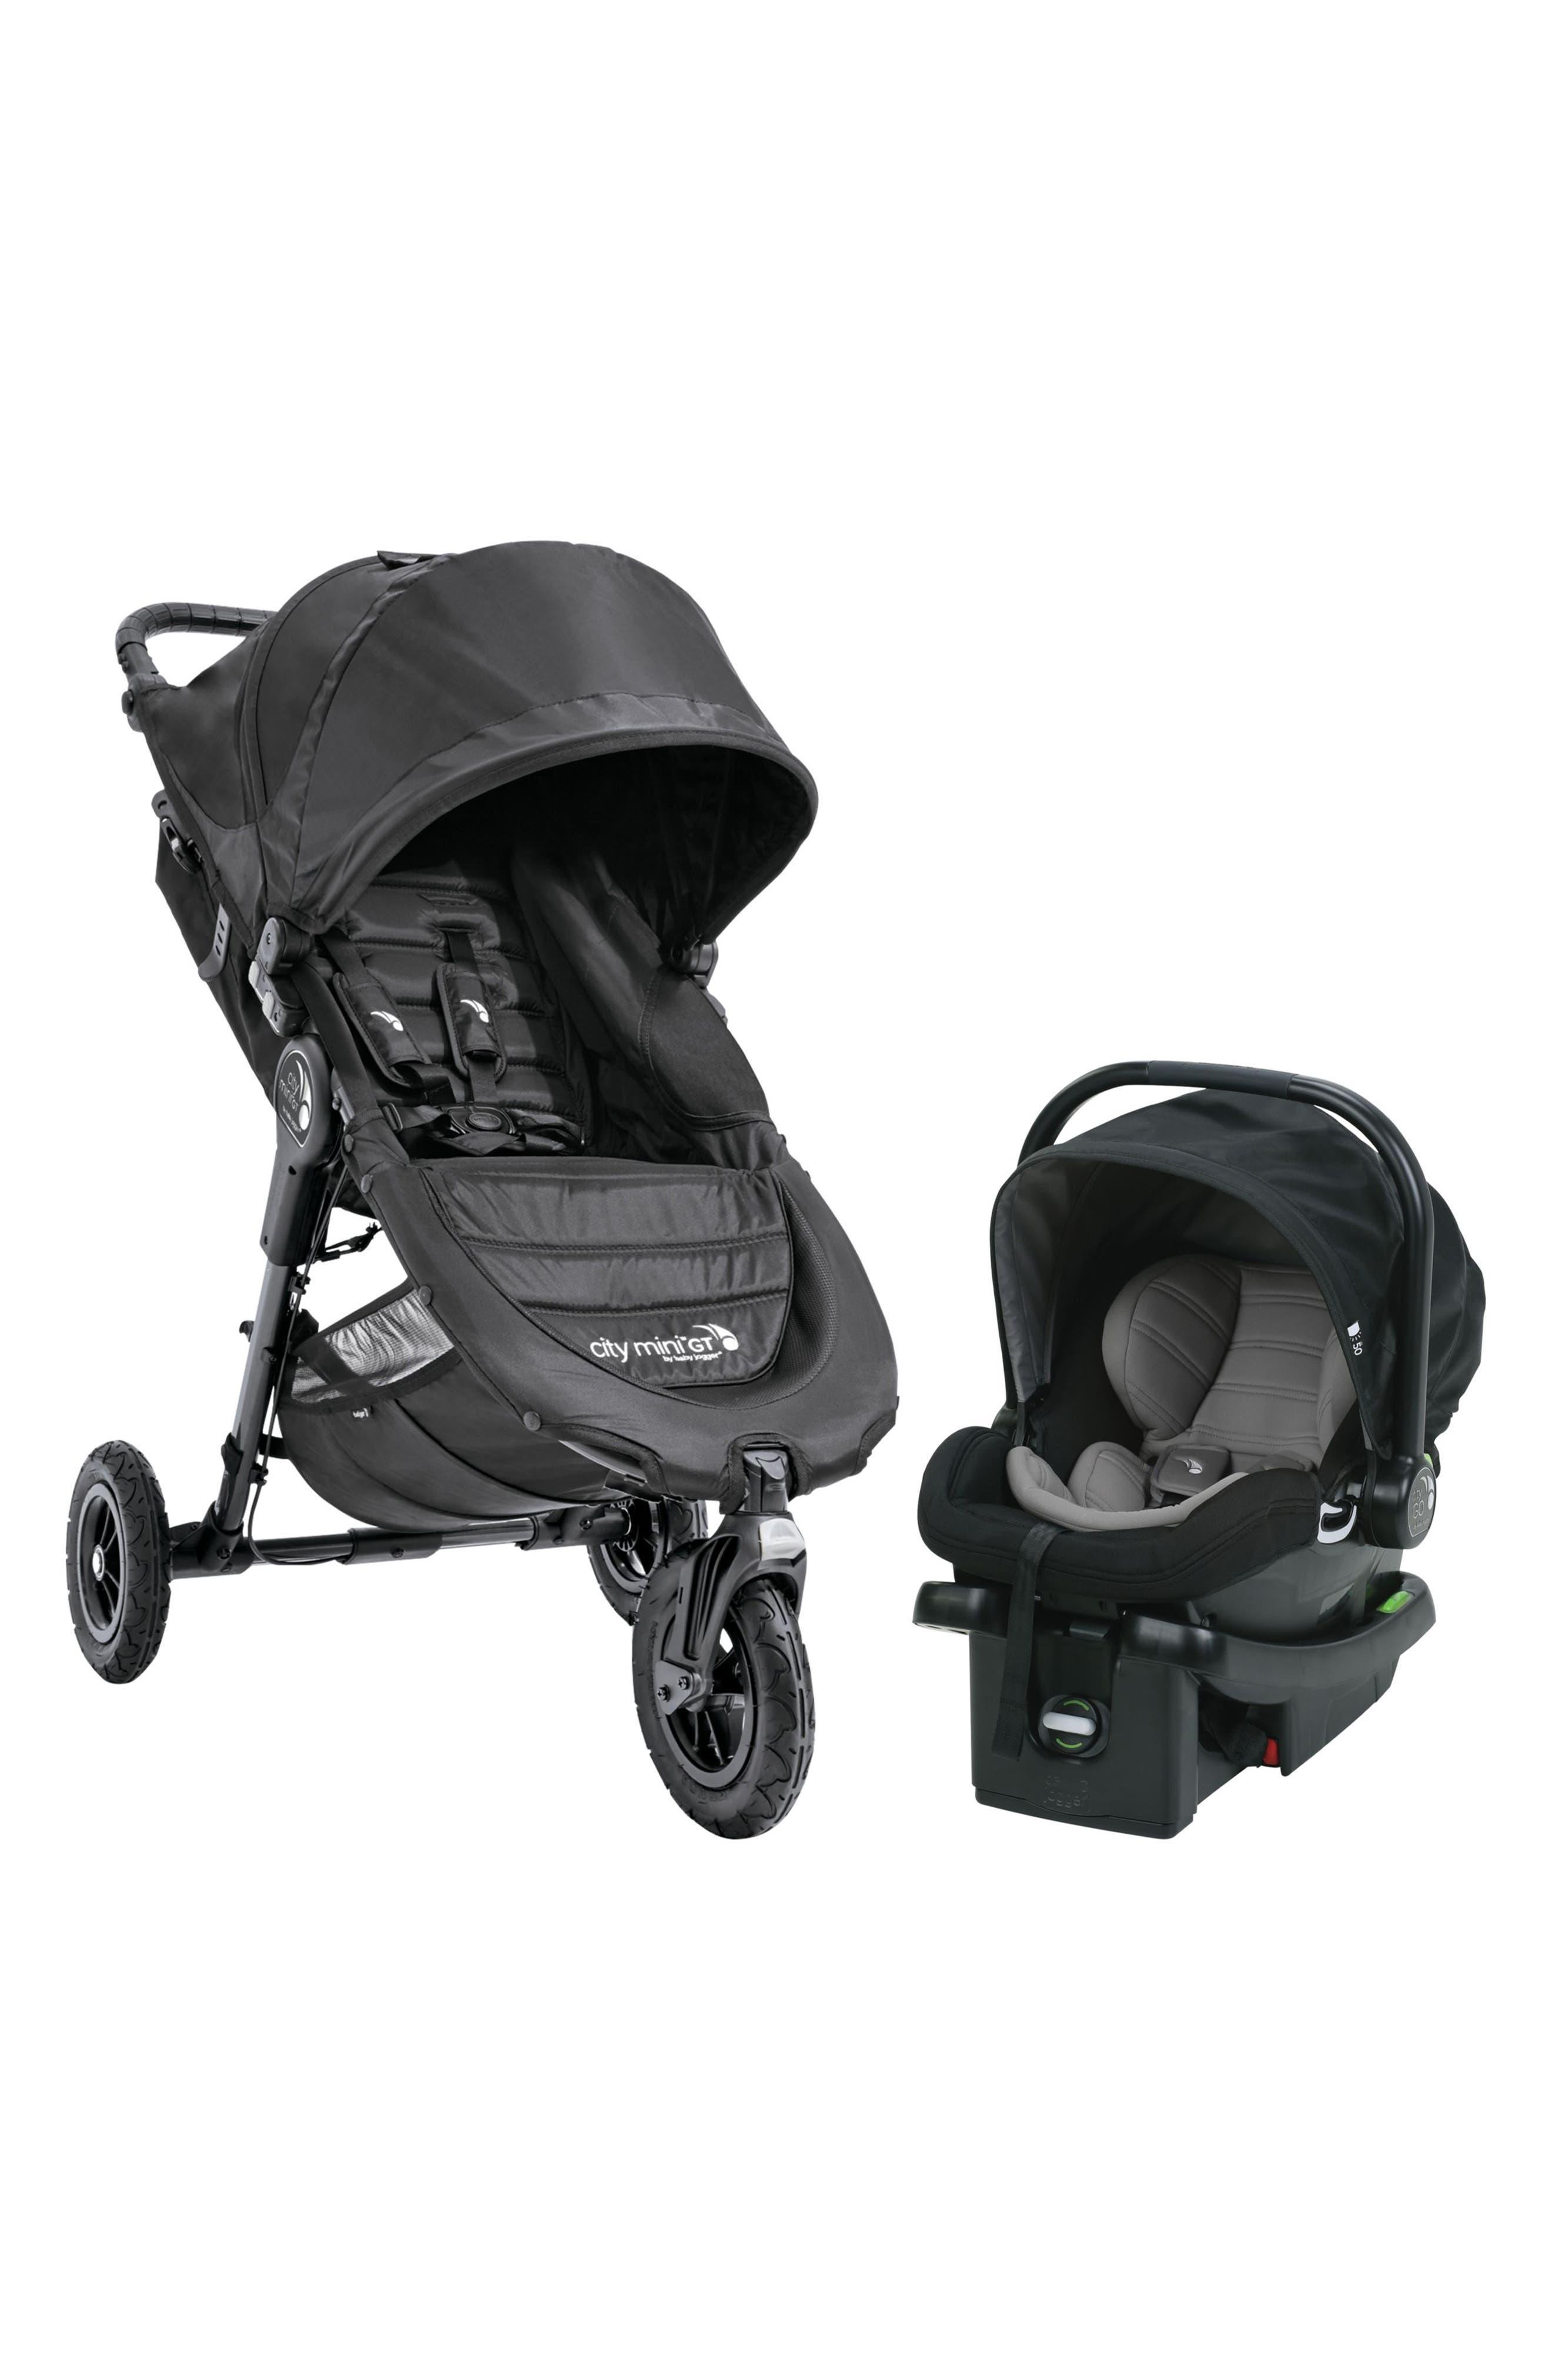 City Mini Double Stroller Car Seat Adapter Graco Snugride